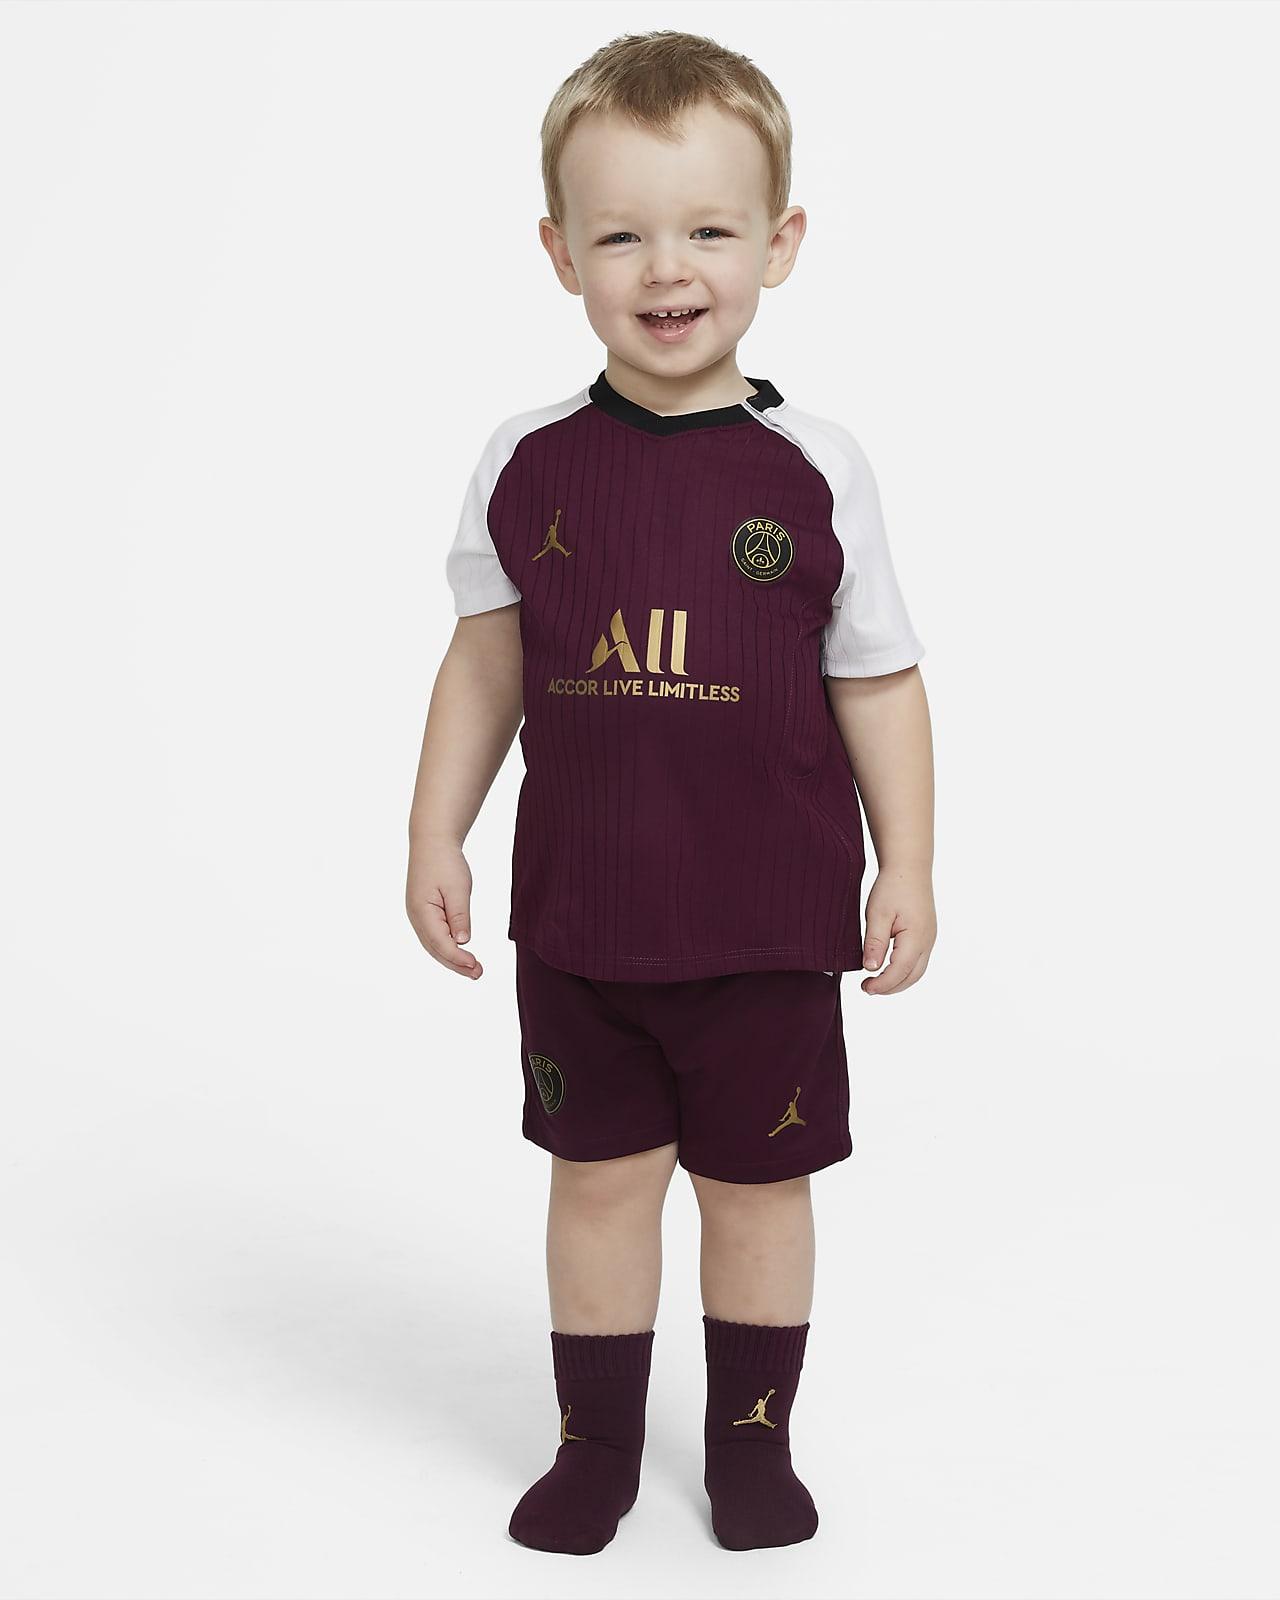 Paris Saint-Germain 2020/21 Third Baby and Toddler Football Kit